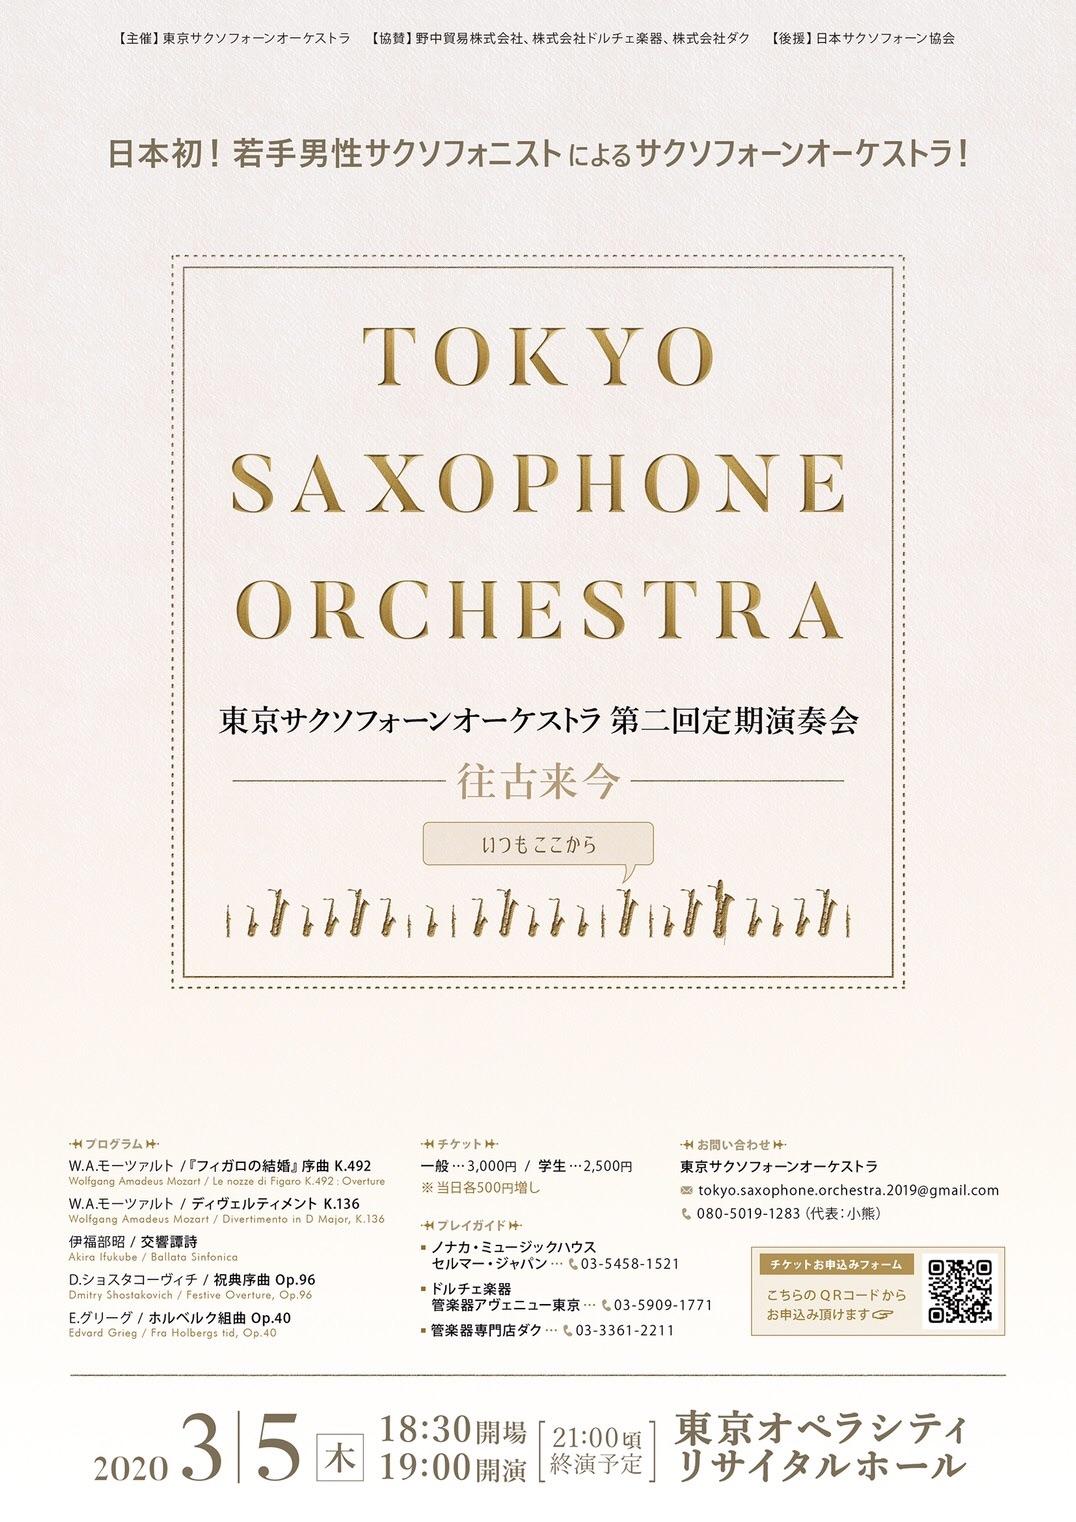 f:id:watson-saxophone0408:20200220135456j:image